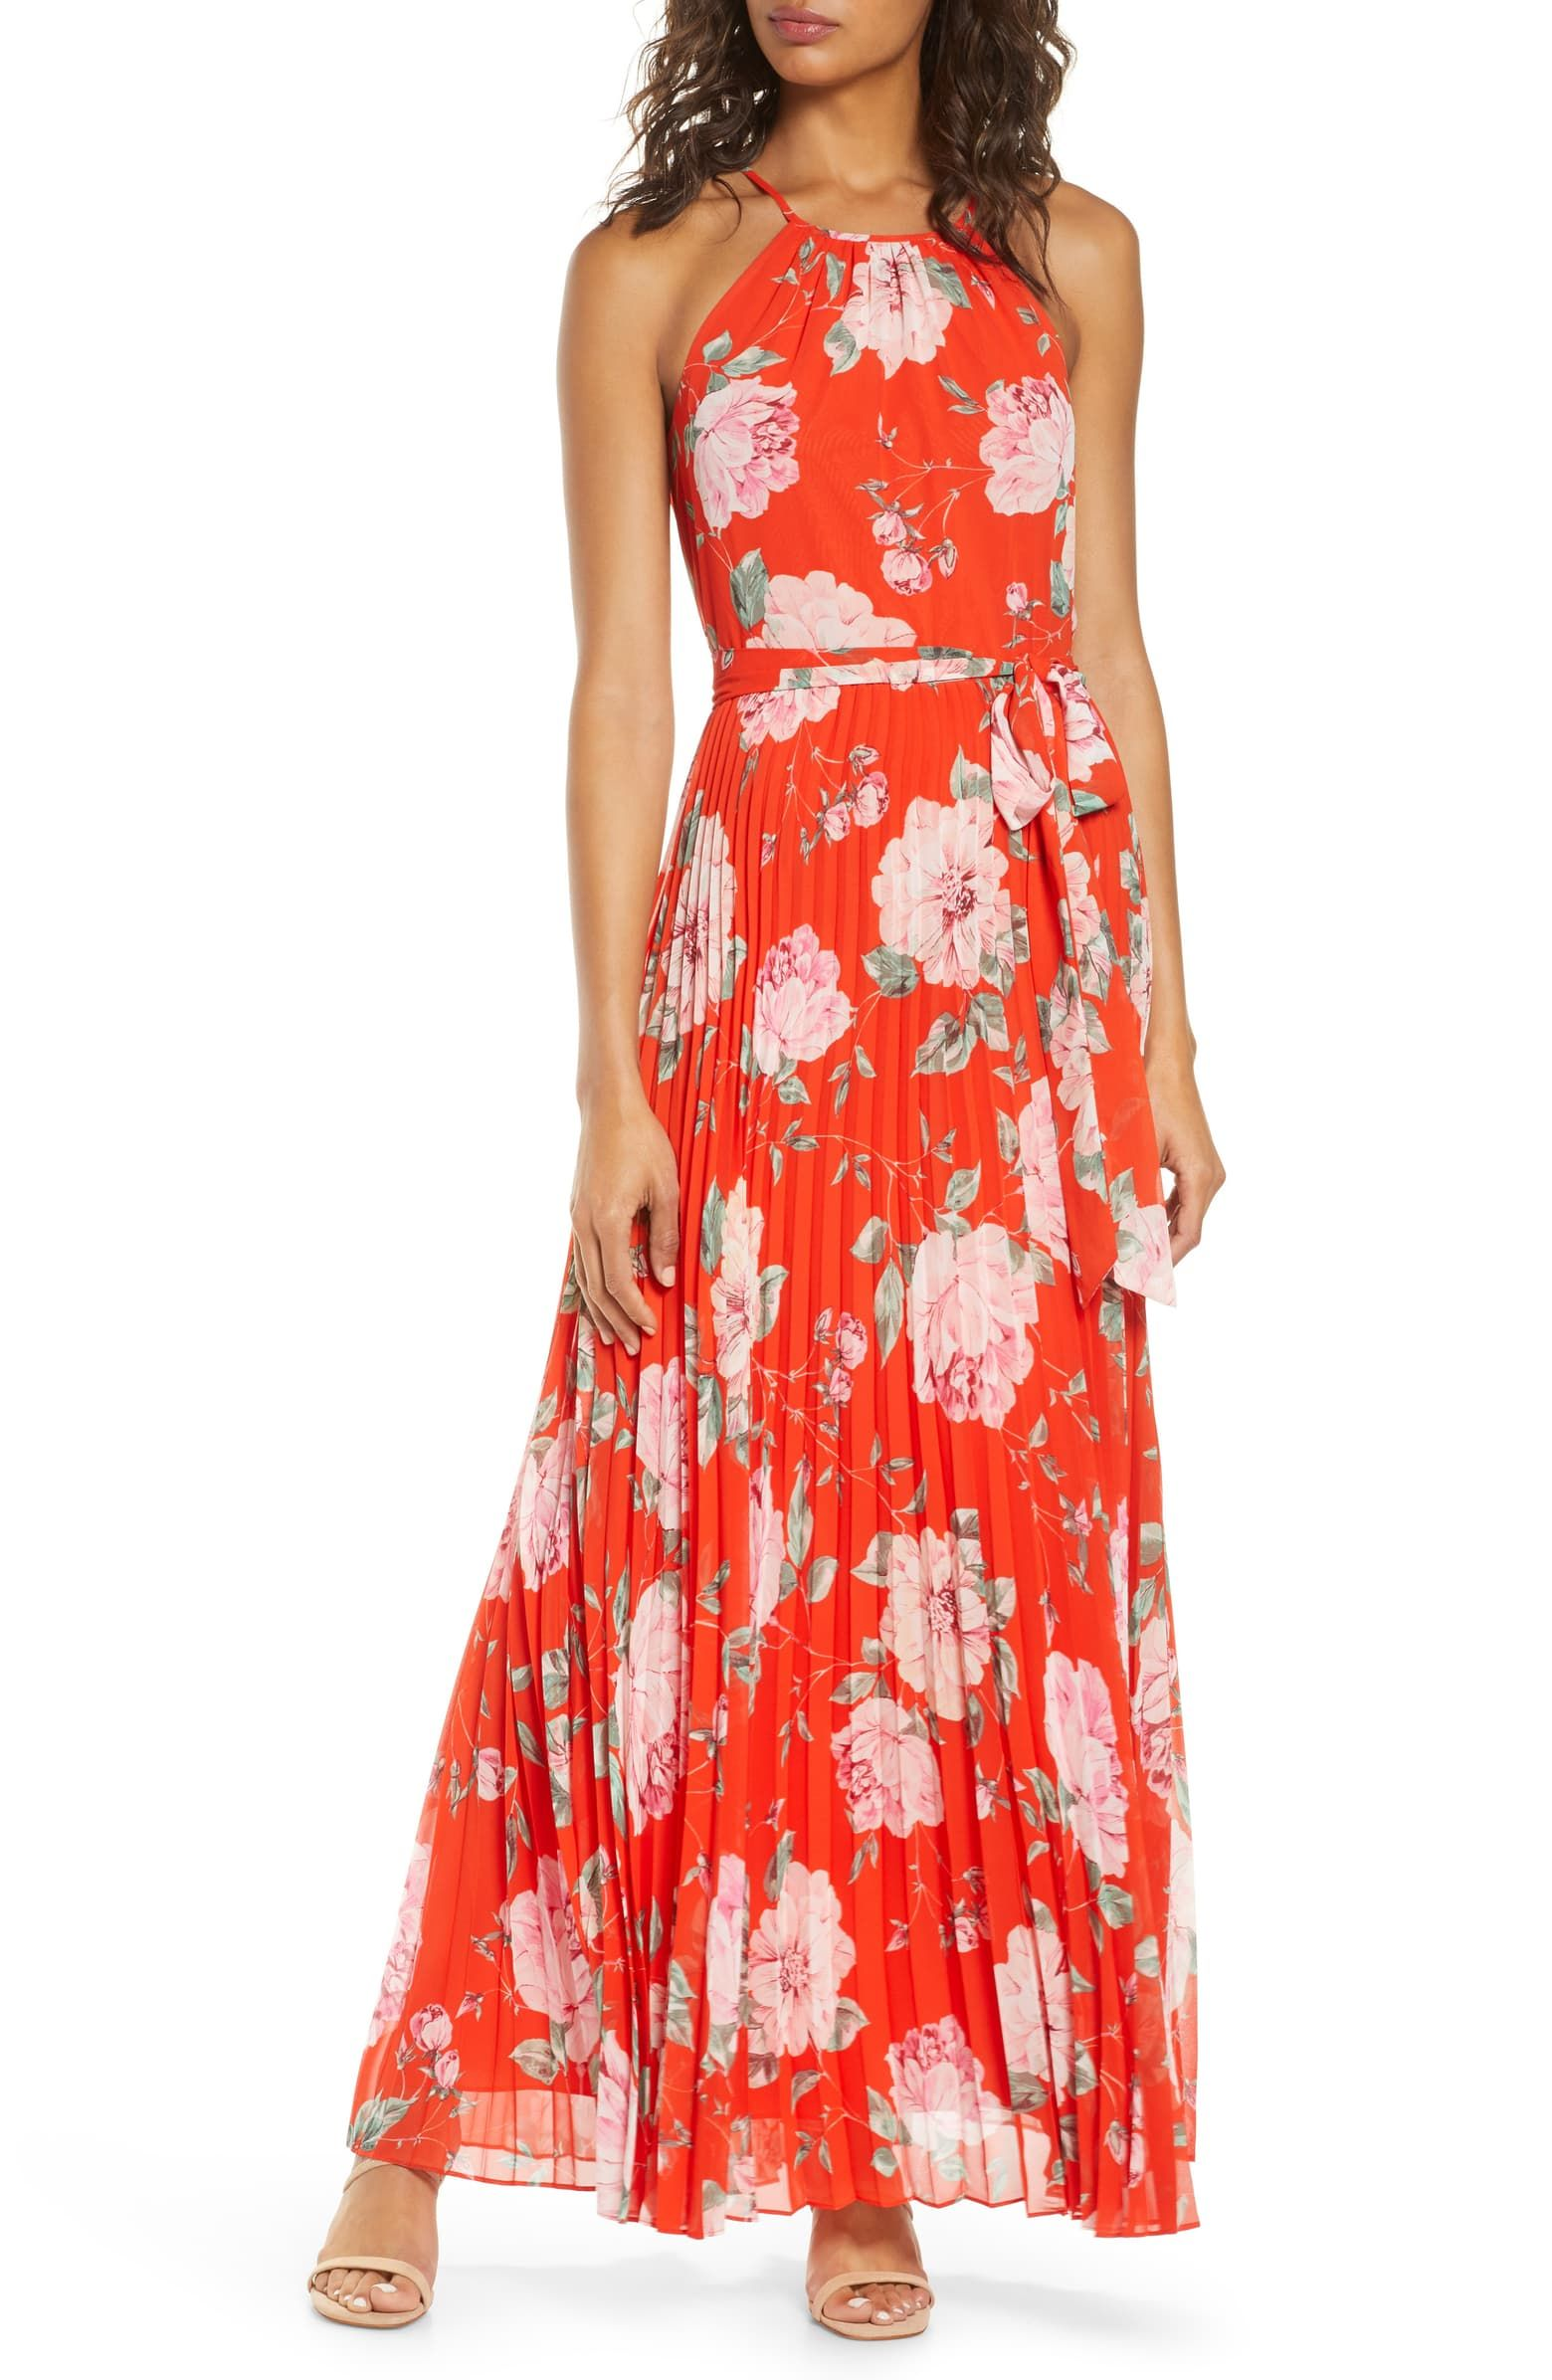 Eliza J Floral Halter Neck Pleated Maxi Dress Nordstrom Maxi Dress Wedding Maxi Dress Elegant Maxi Dress [ 2392 x 1560 Pixel ]